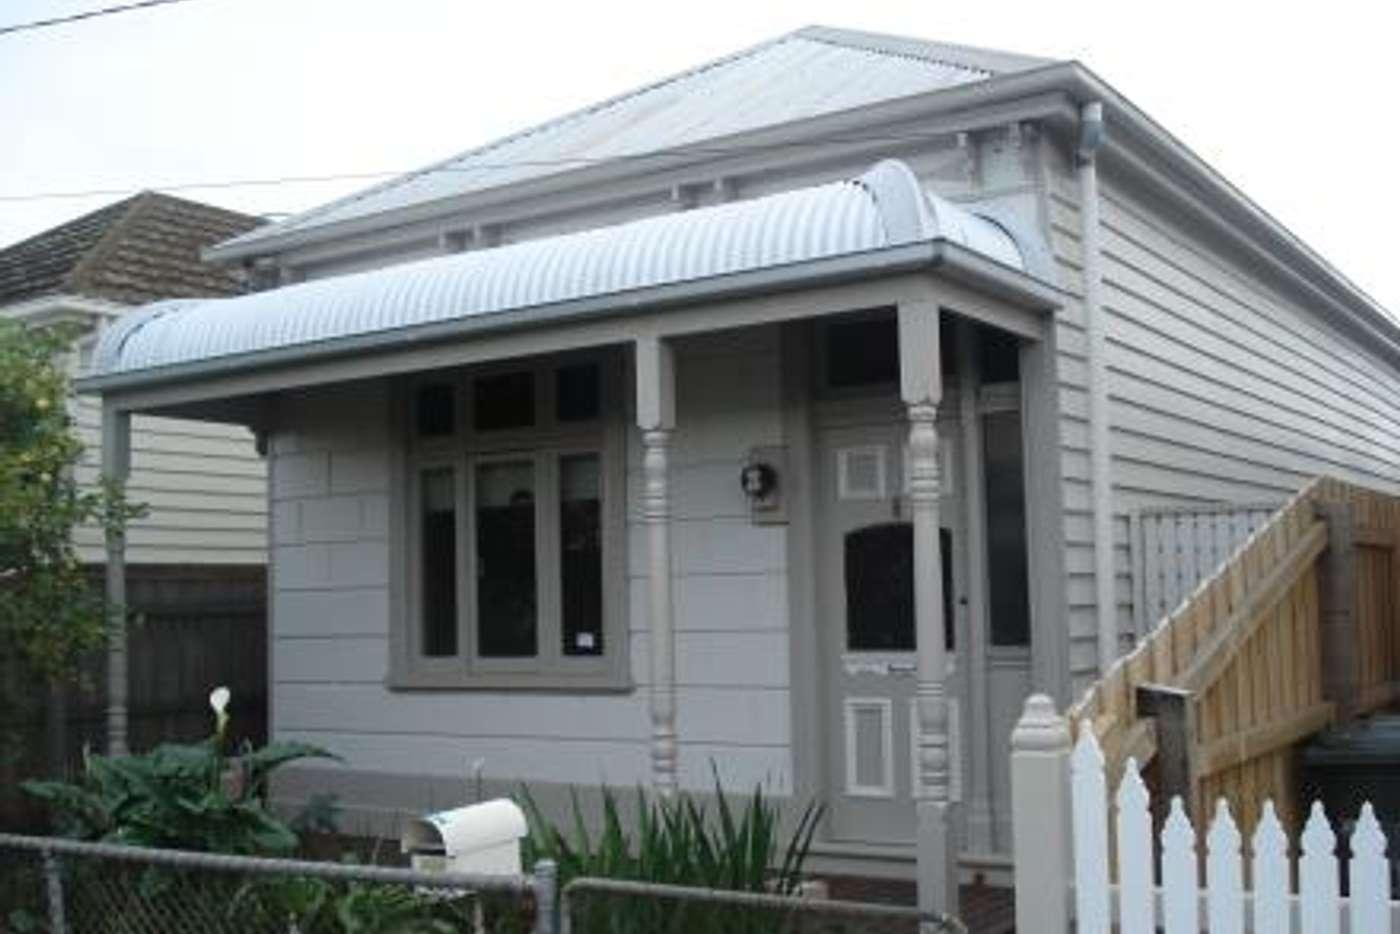 Main view of Homely house listing, 48 Seddon Street, Seddon VIC 3011